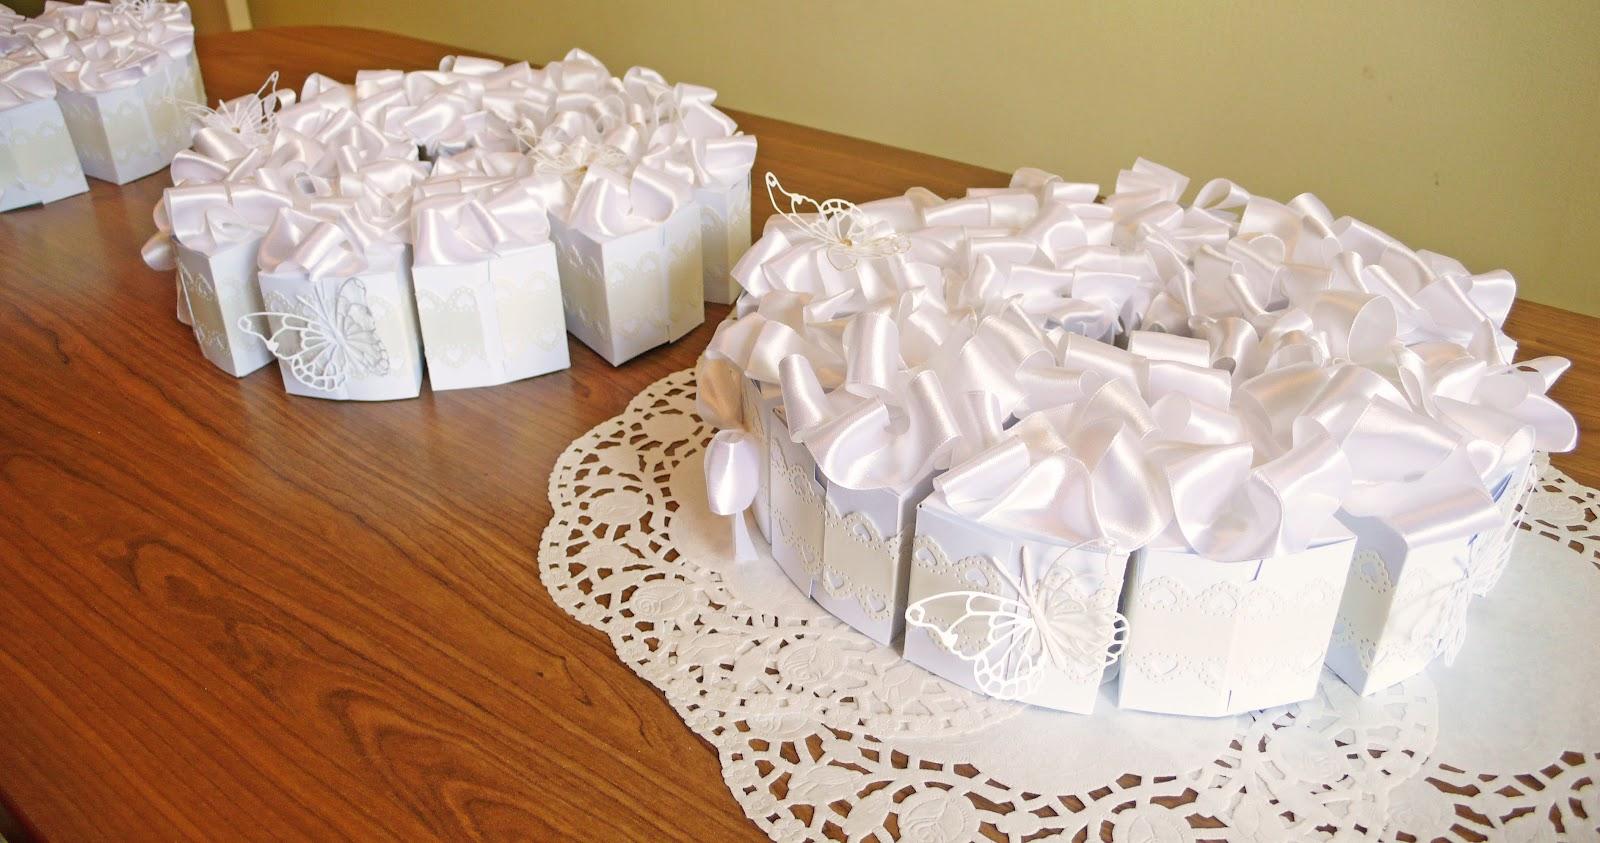 Торт из бумаги и картона с пожеланиями и сюрпризом своими руками: шаблон 96